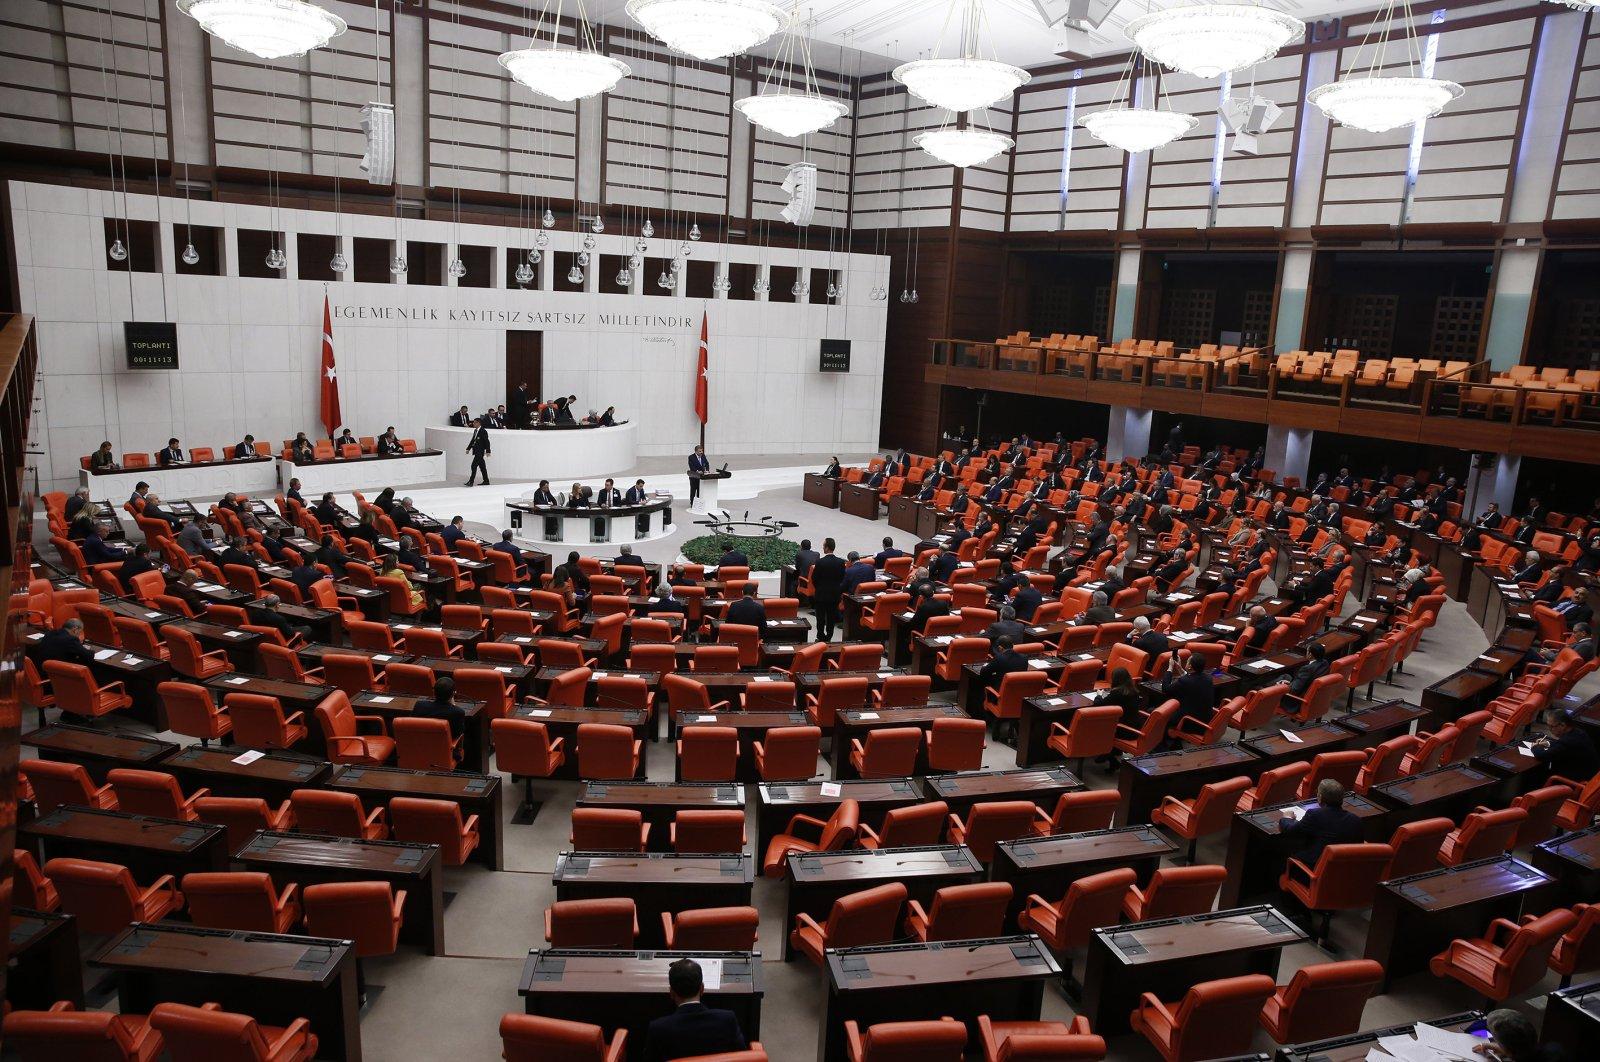 Health Minister Fahrettin Koca made a speech in the assembly regarding COVID-19, March 20, 2020 (AA Photo)